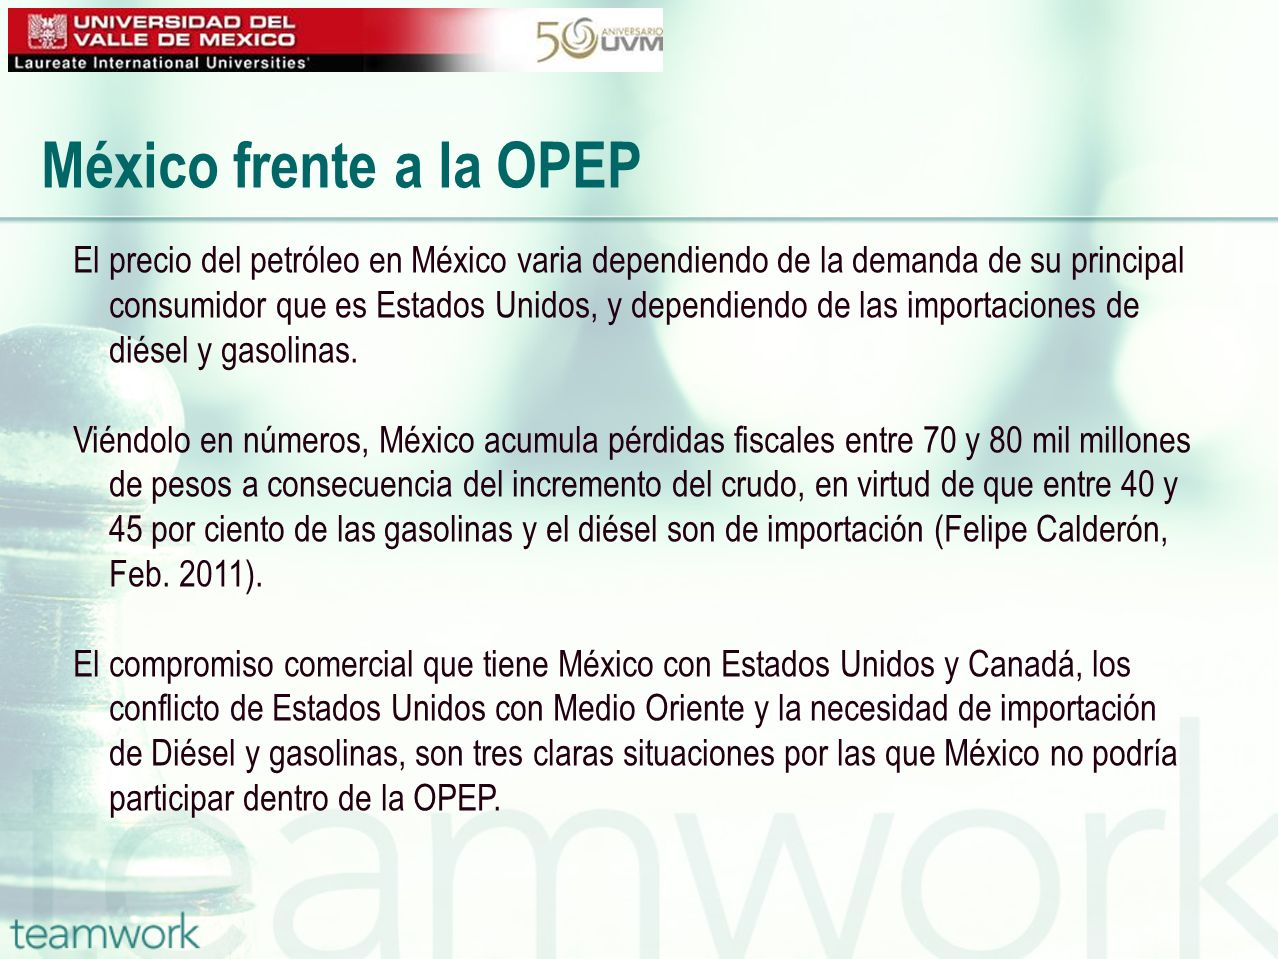 México frente a la OPEP